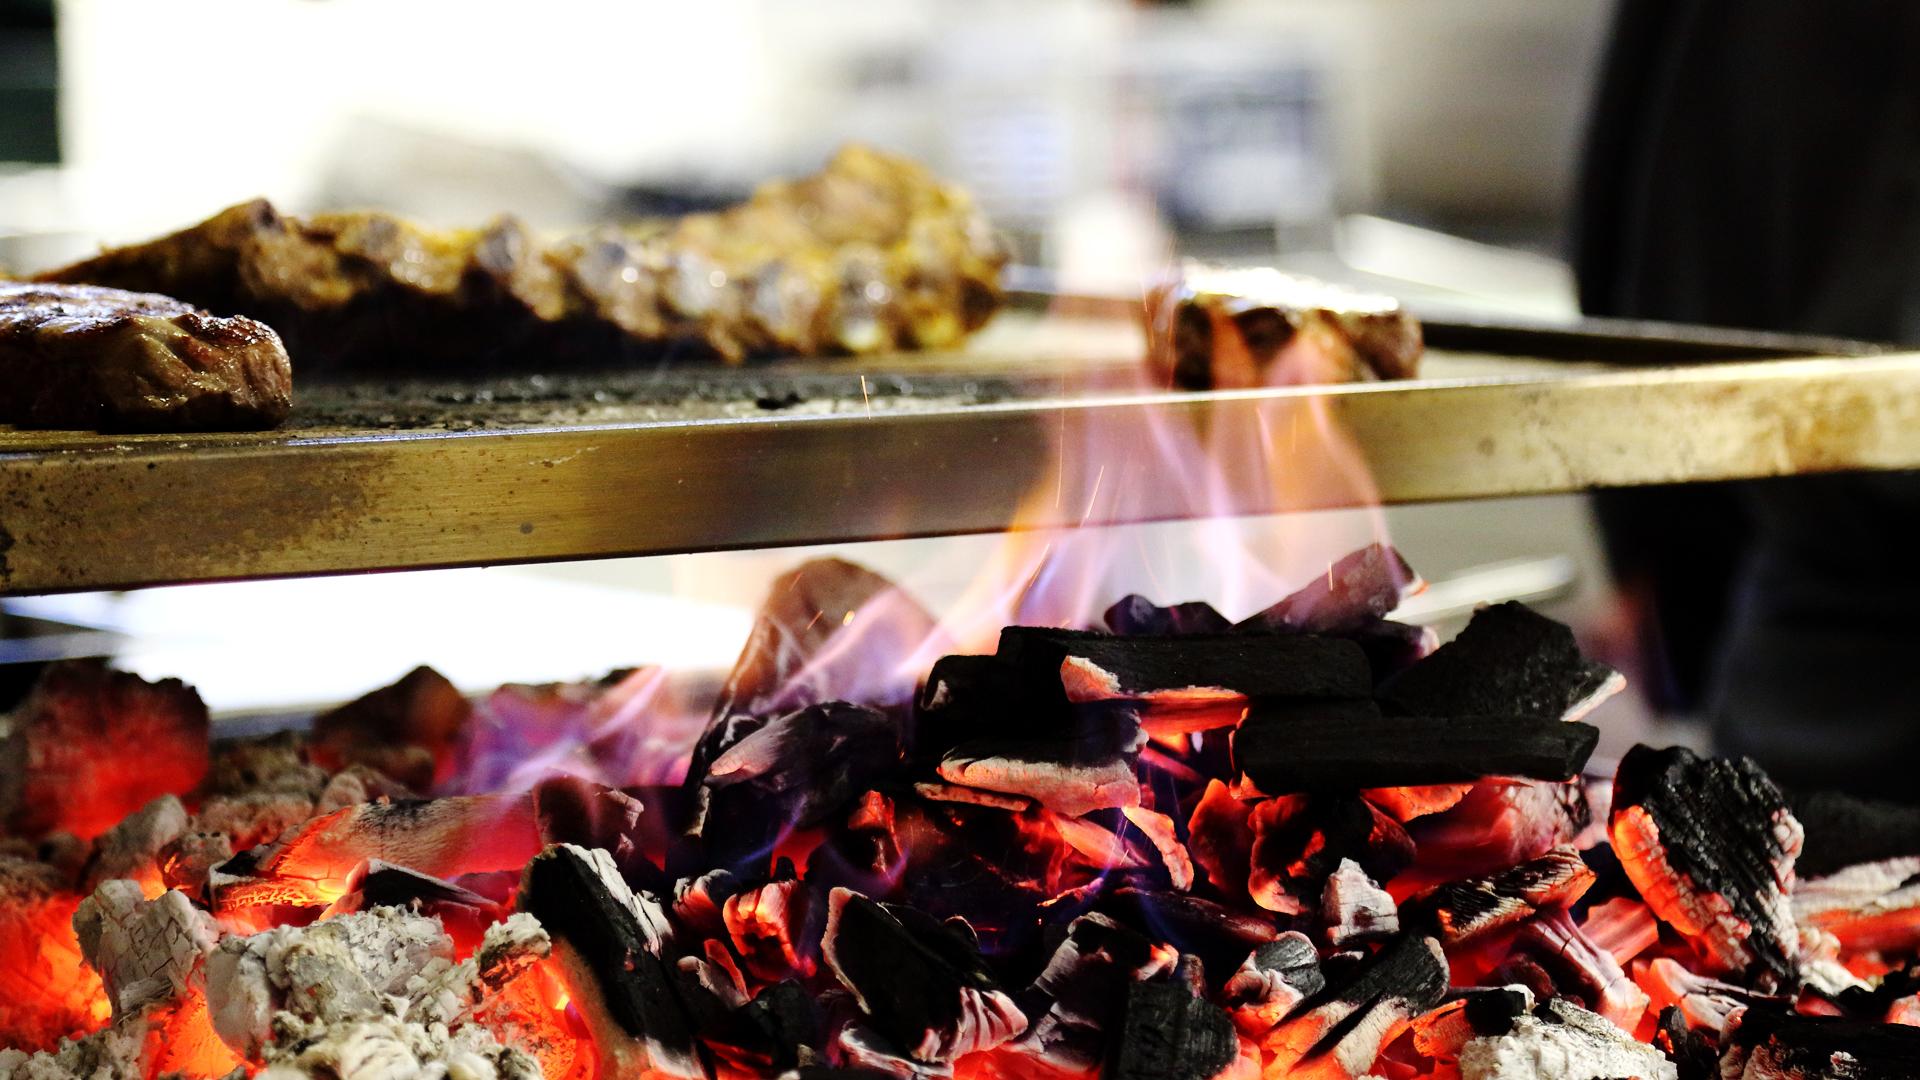 Grill-Restaurant Baulüüt: Glühende Kohle